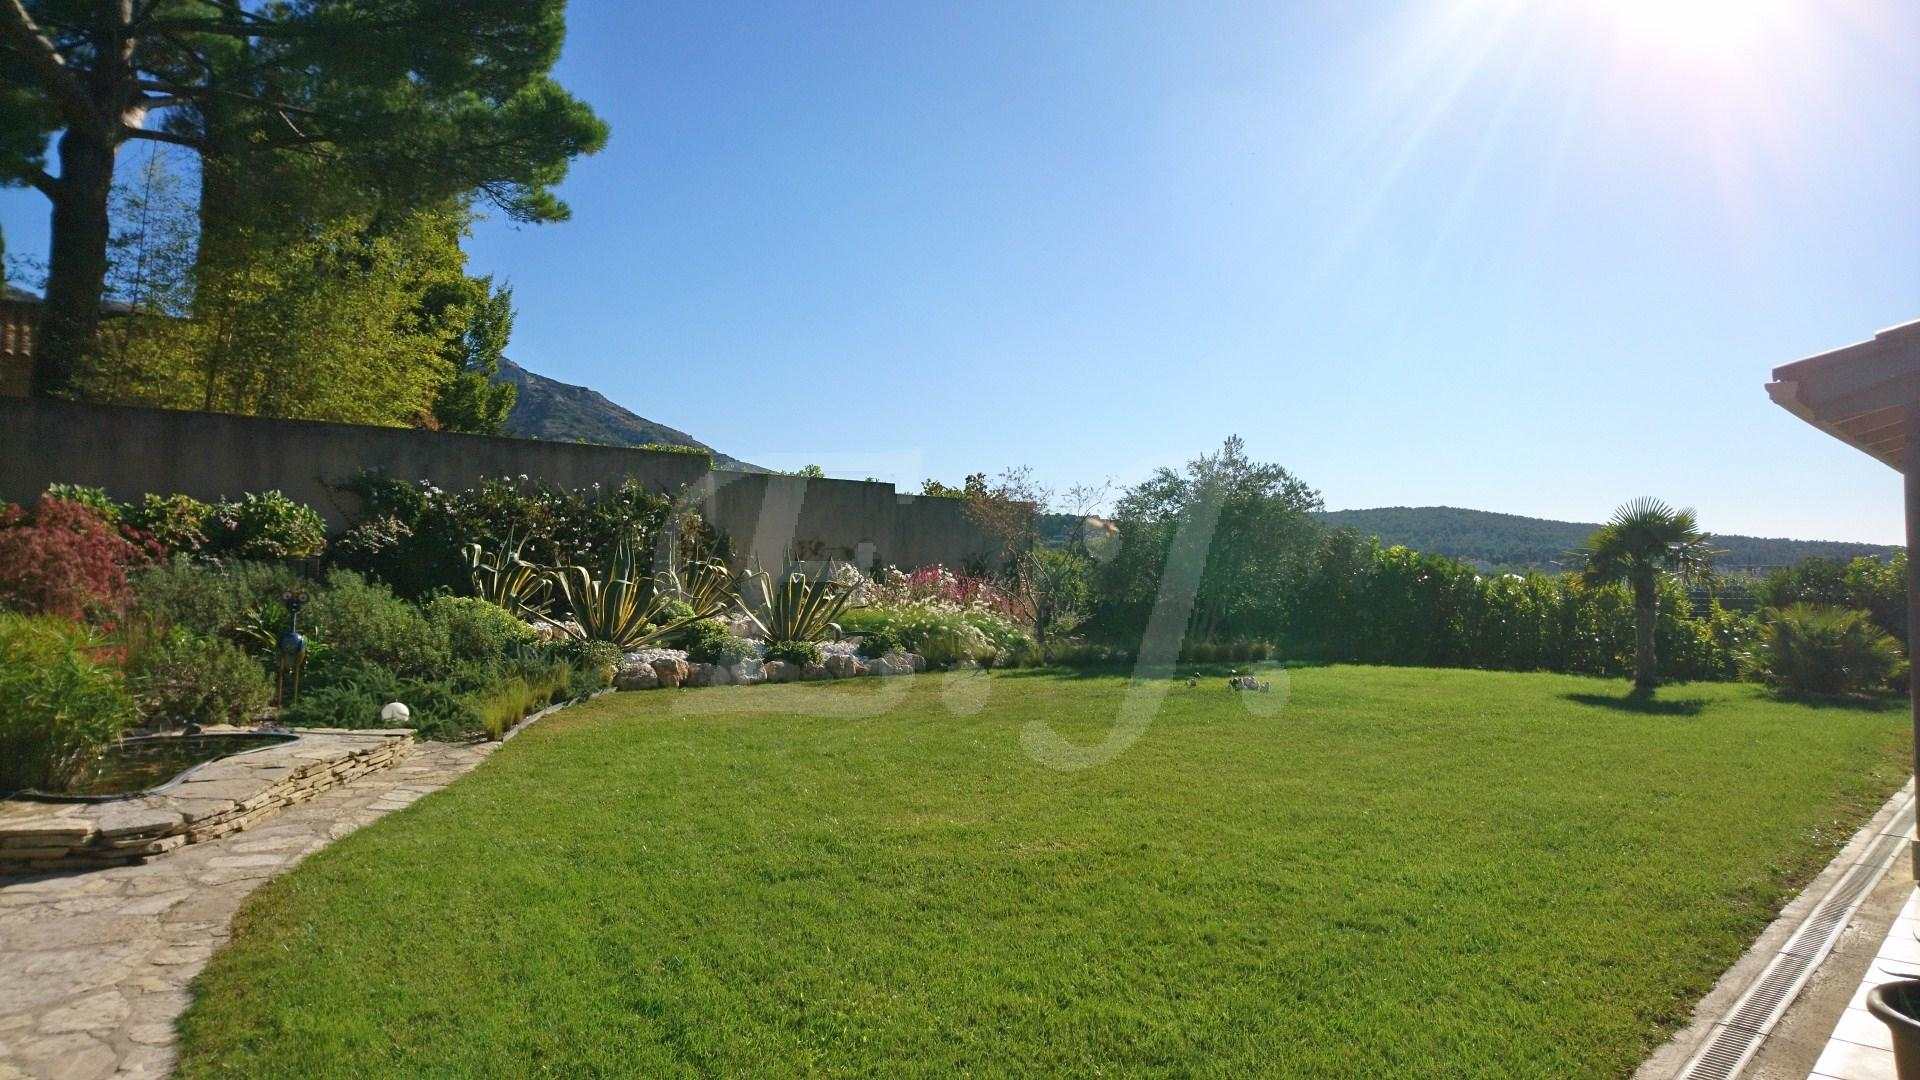 Ventes maison robion moderne avec piscine et jardin arbor for Villa avec jardin et piscine